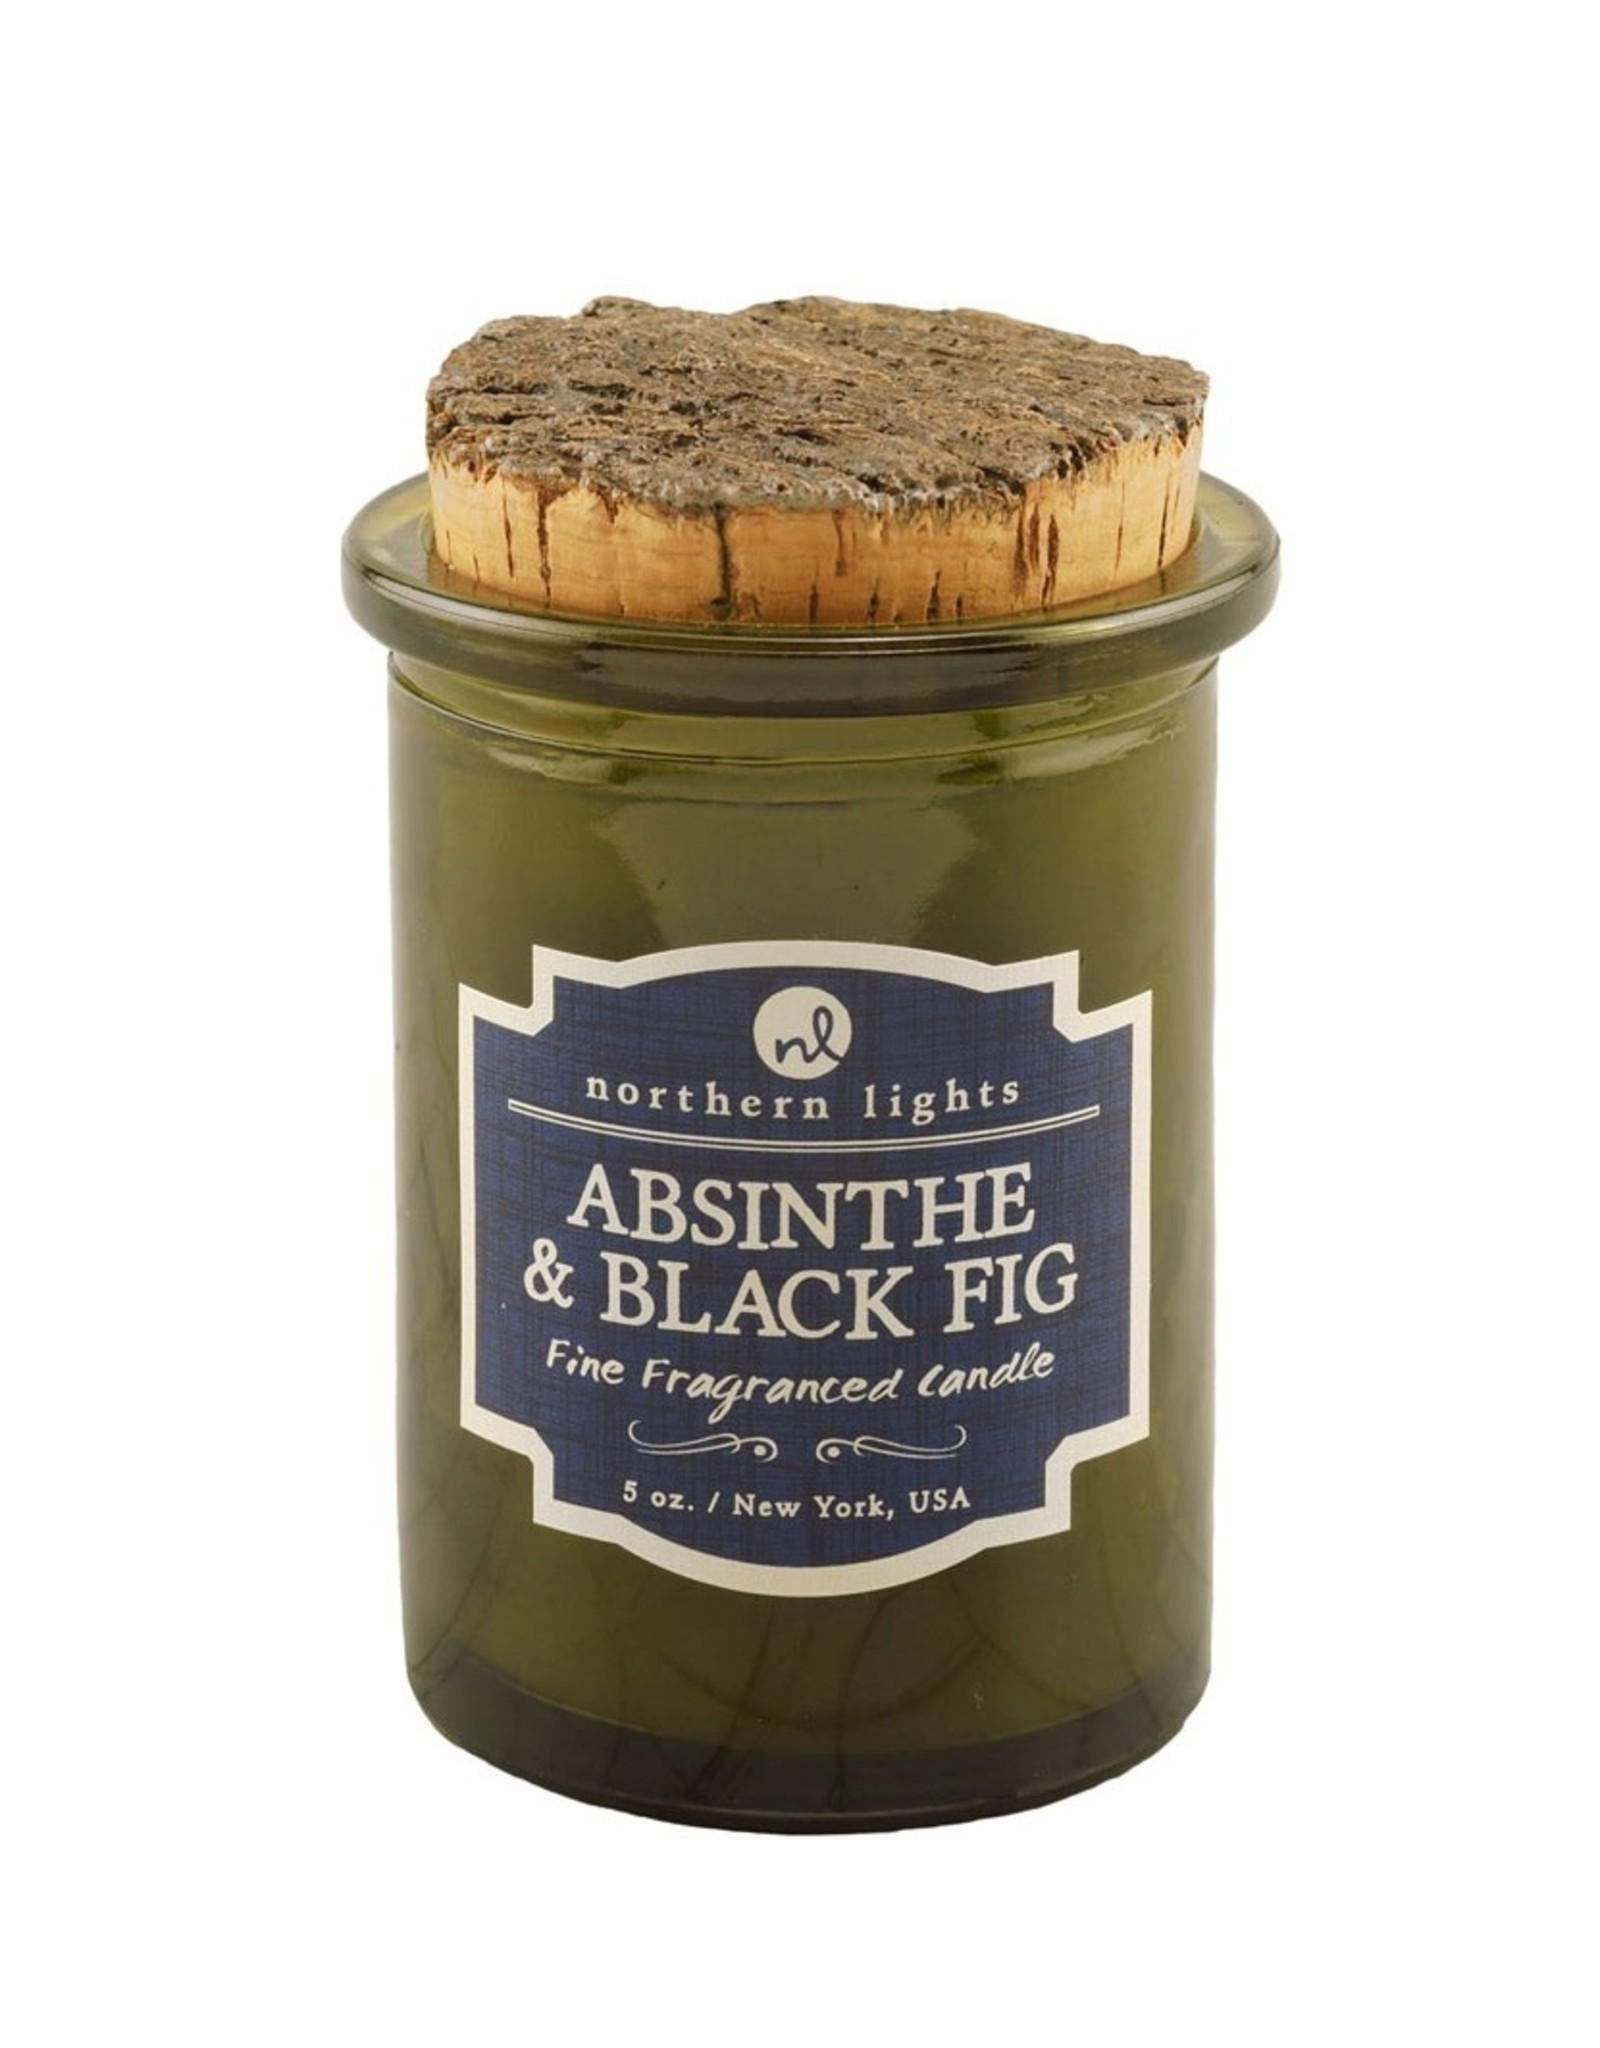 Northern Lights Candles Absinthe & Black Fig 5oz Spirit Candle